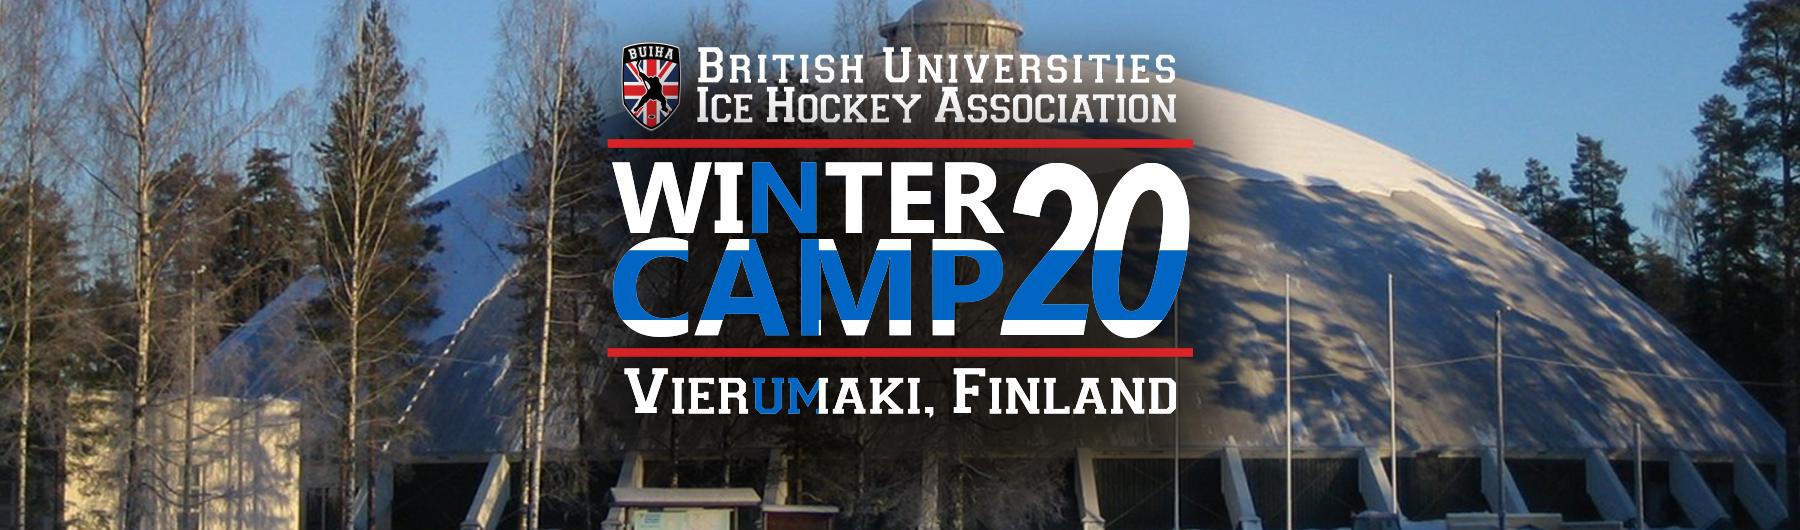 BUIHA Winter Training Camp - Vierumäki 2020